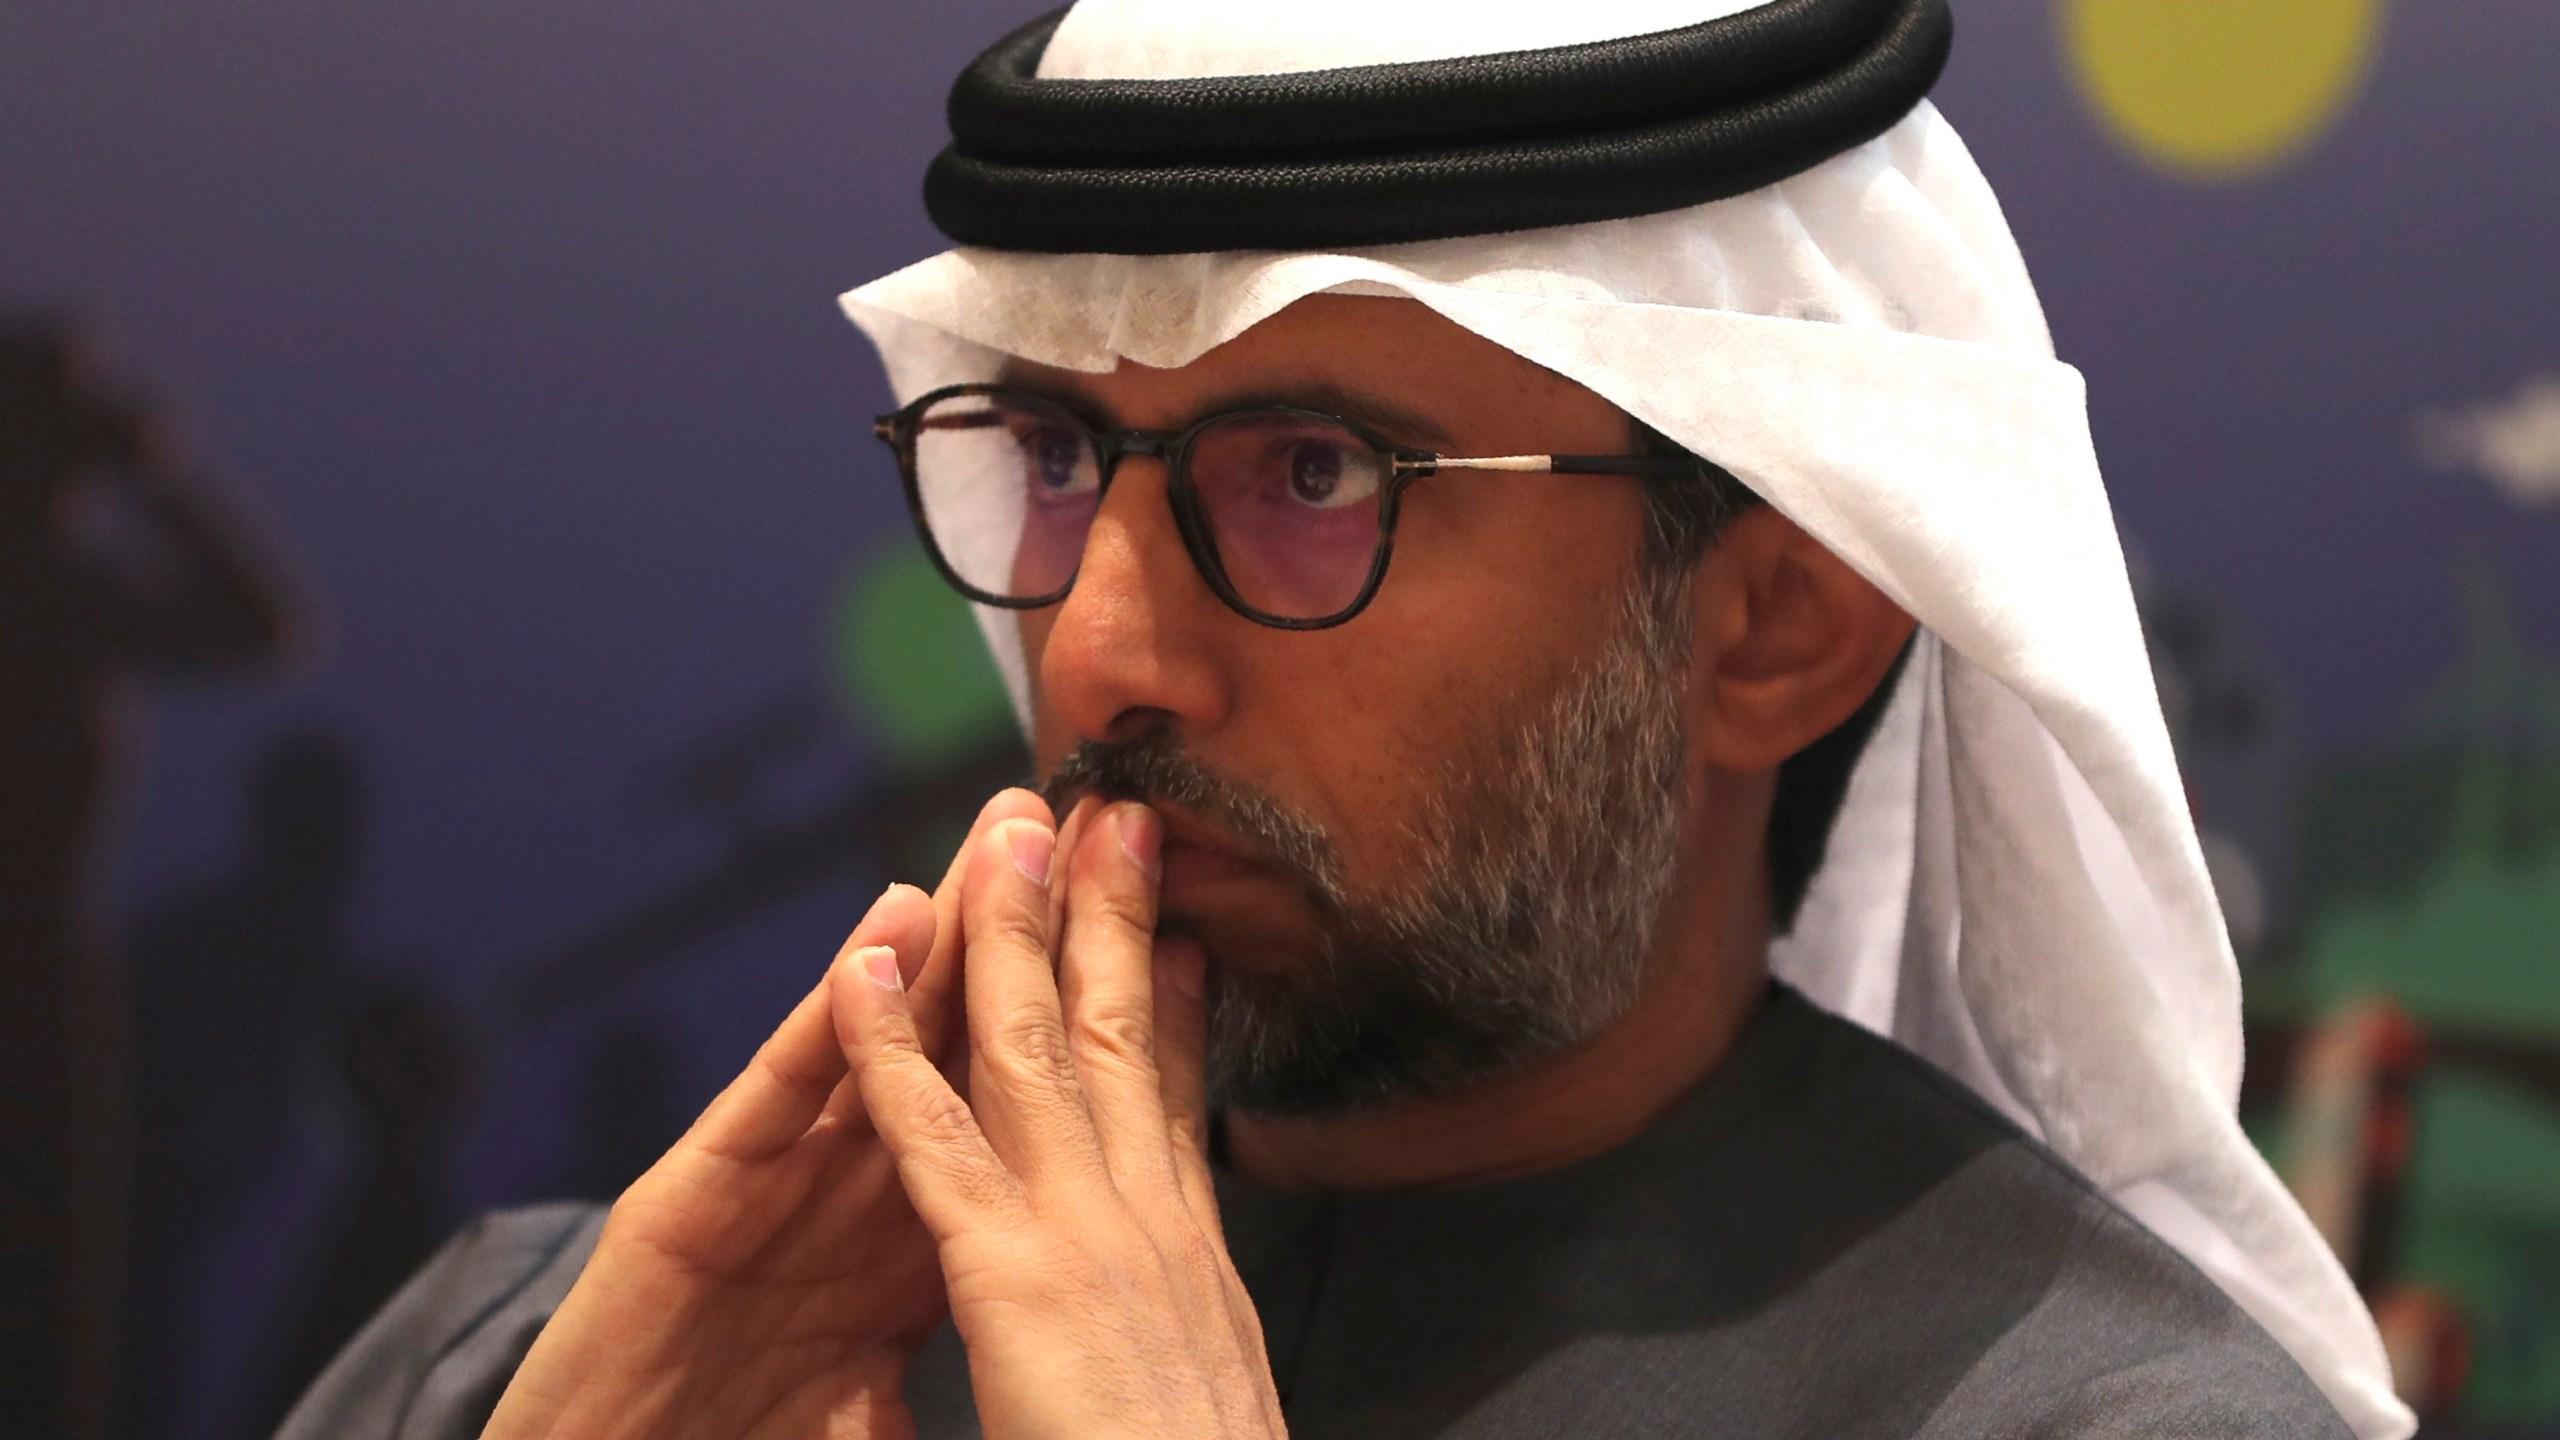 Suhail al-Mazrouei